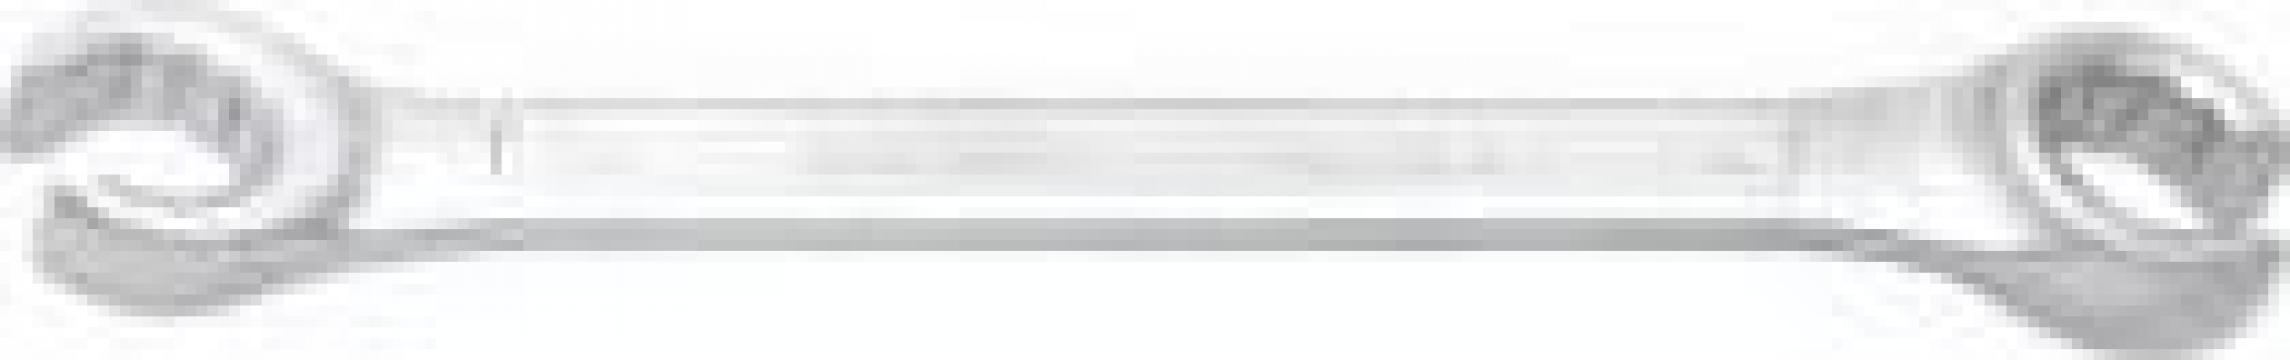 Cheie inelara dublu decupata de la Electrofrane